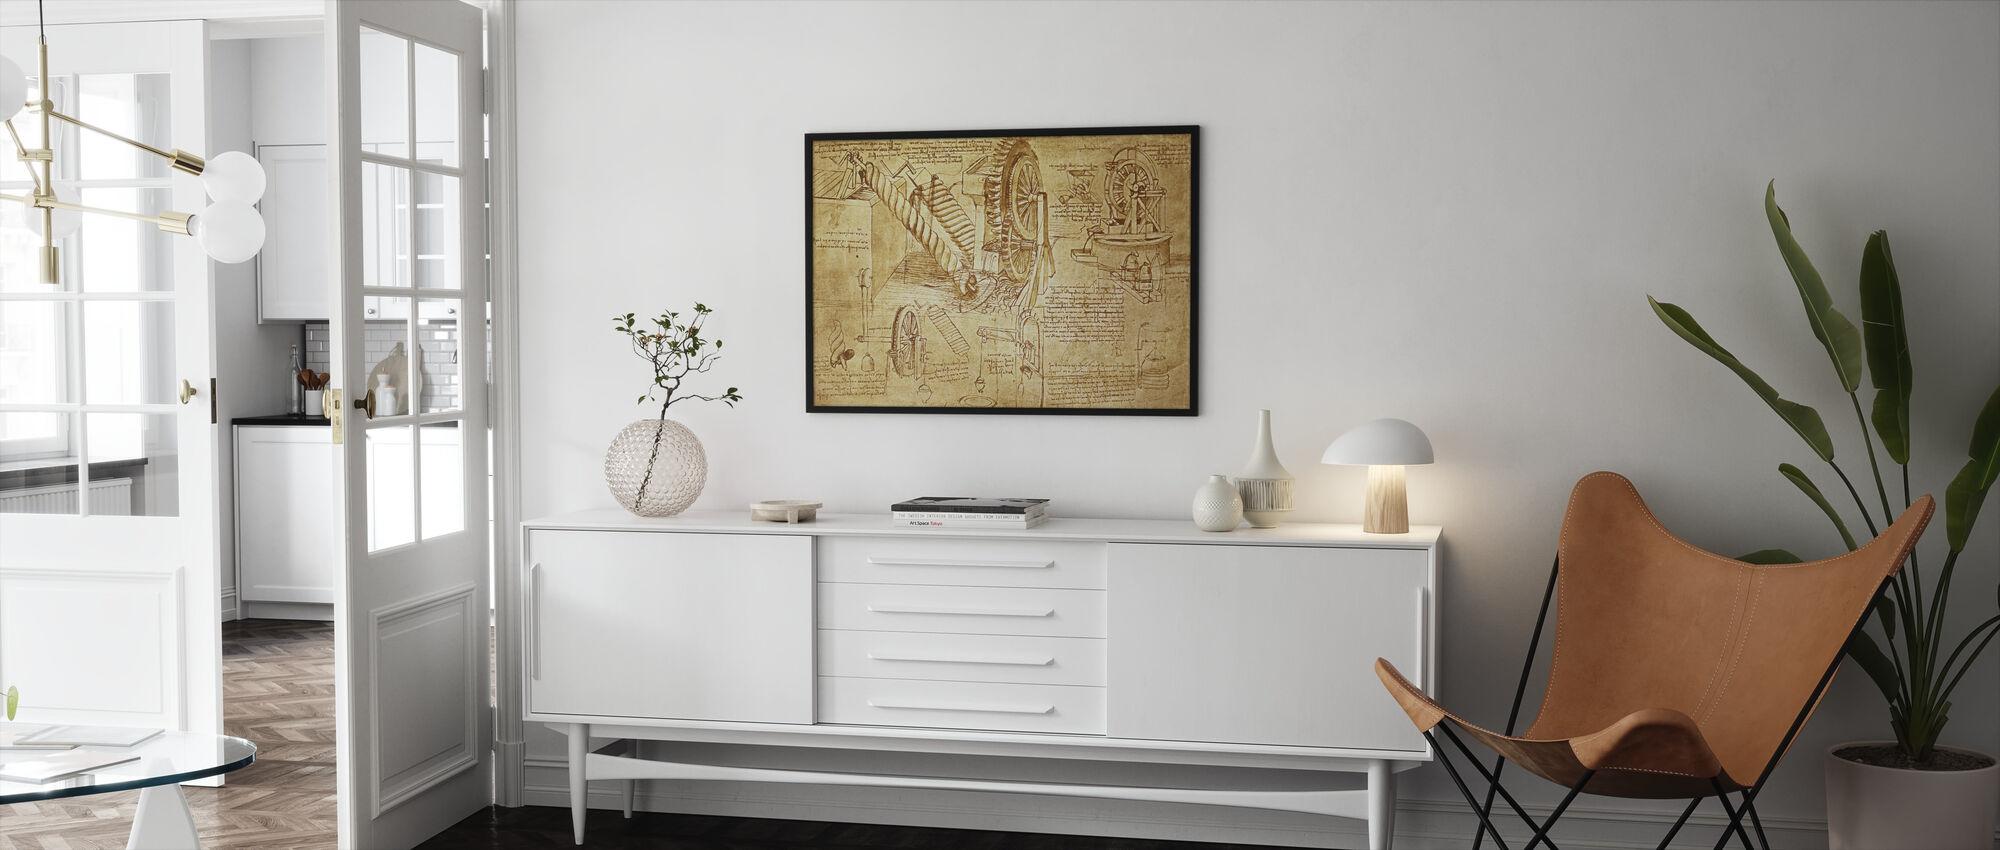 Leonardo da Vinci - Atlanticus - Innrammet bilde - Stue